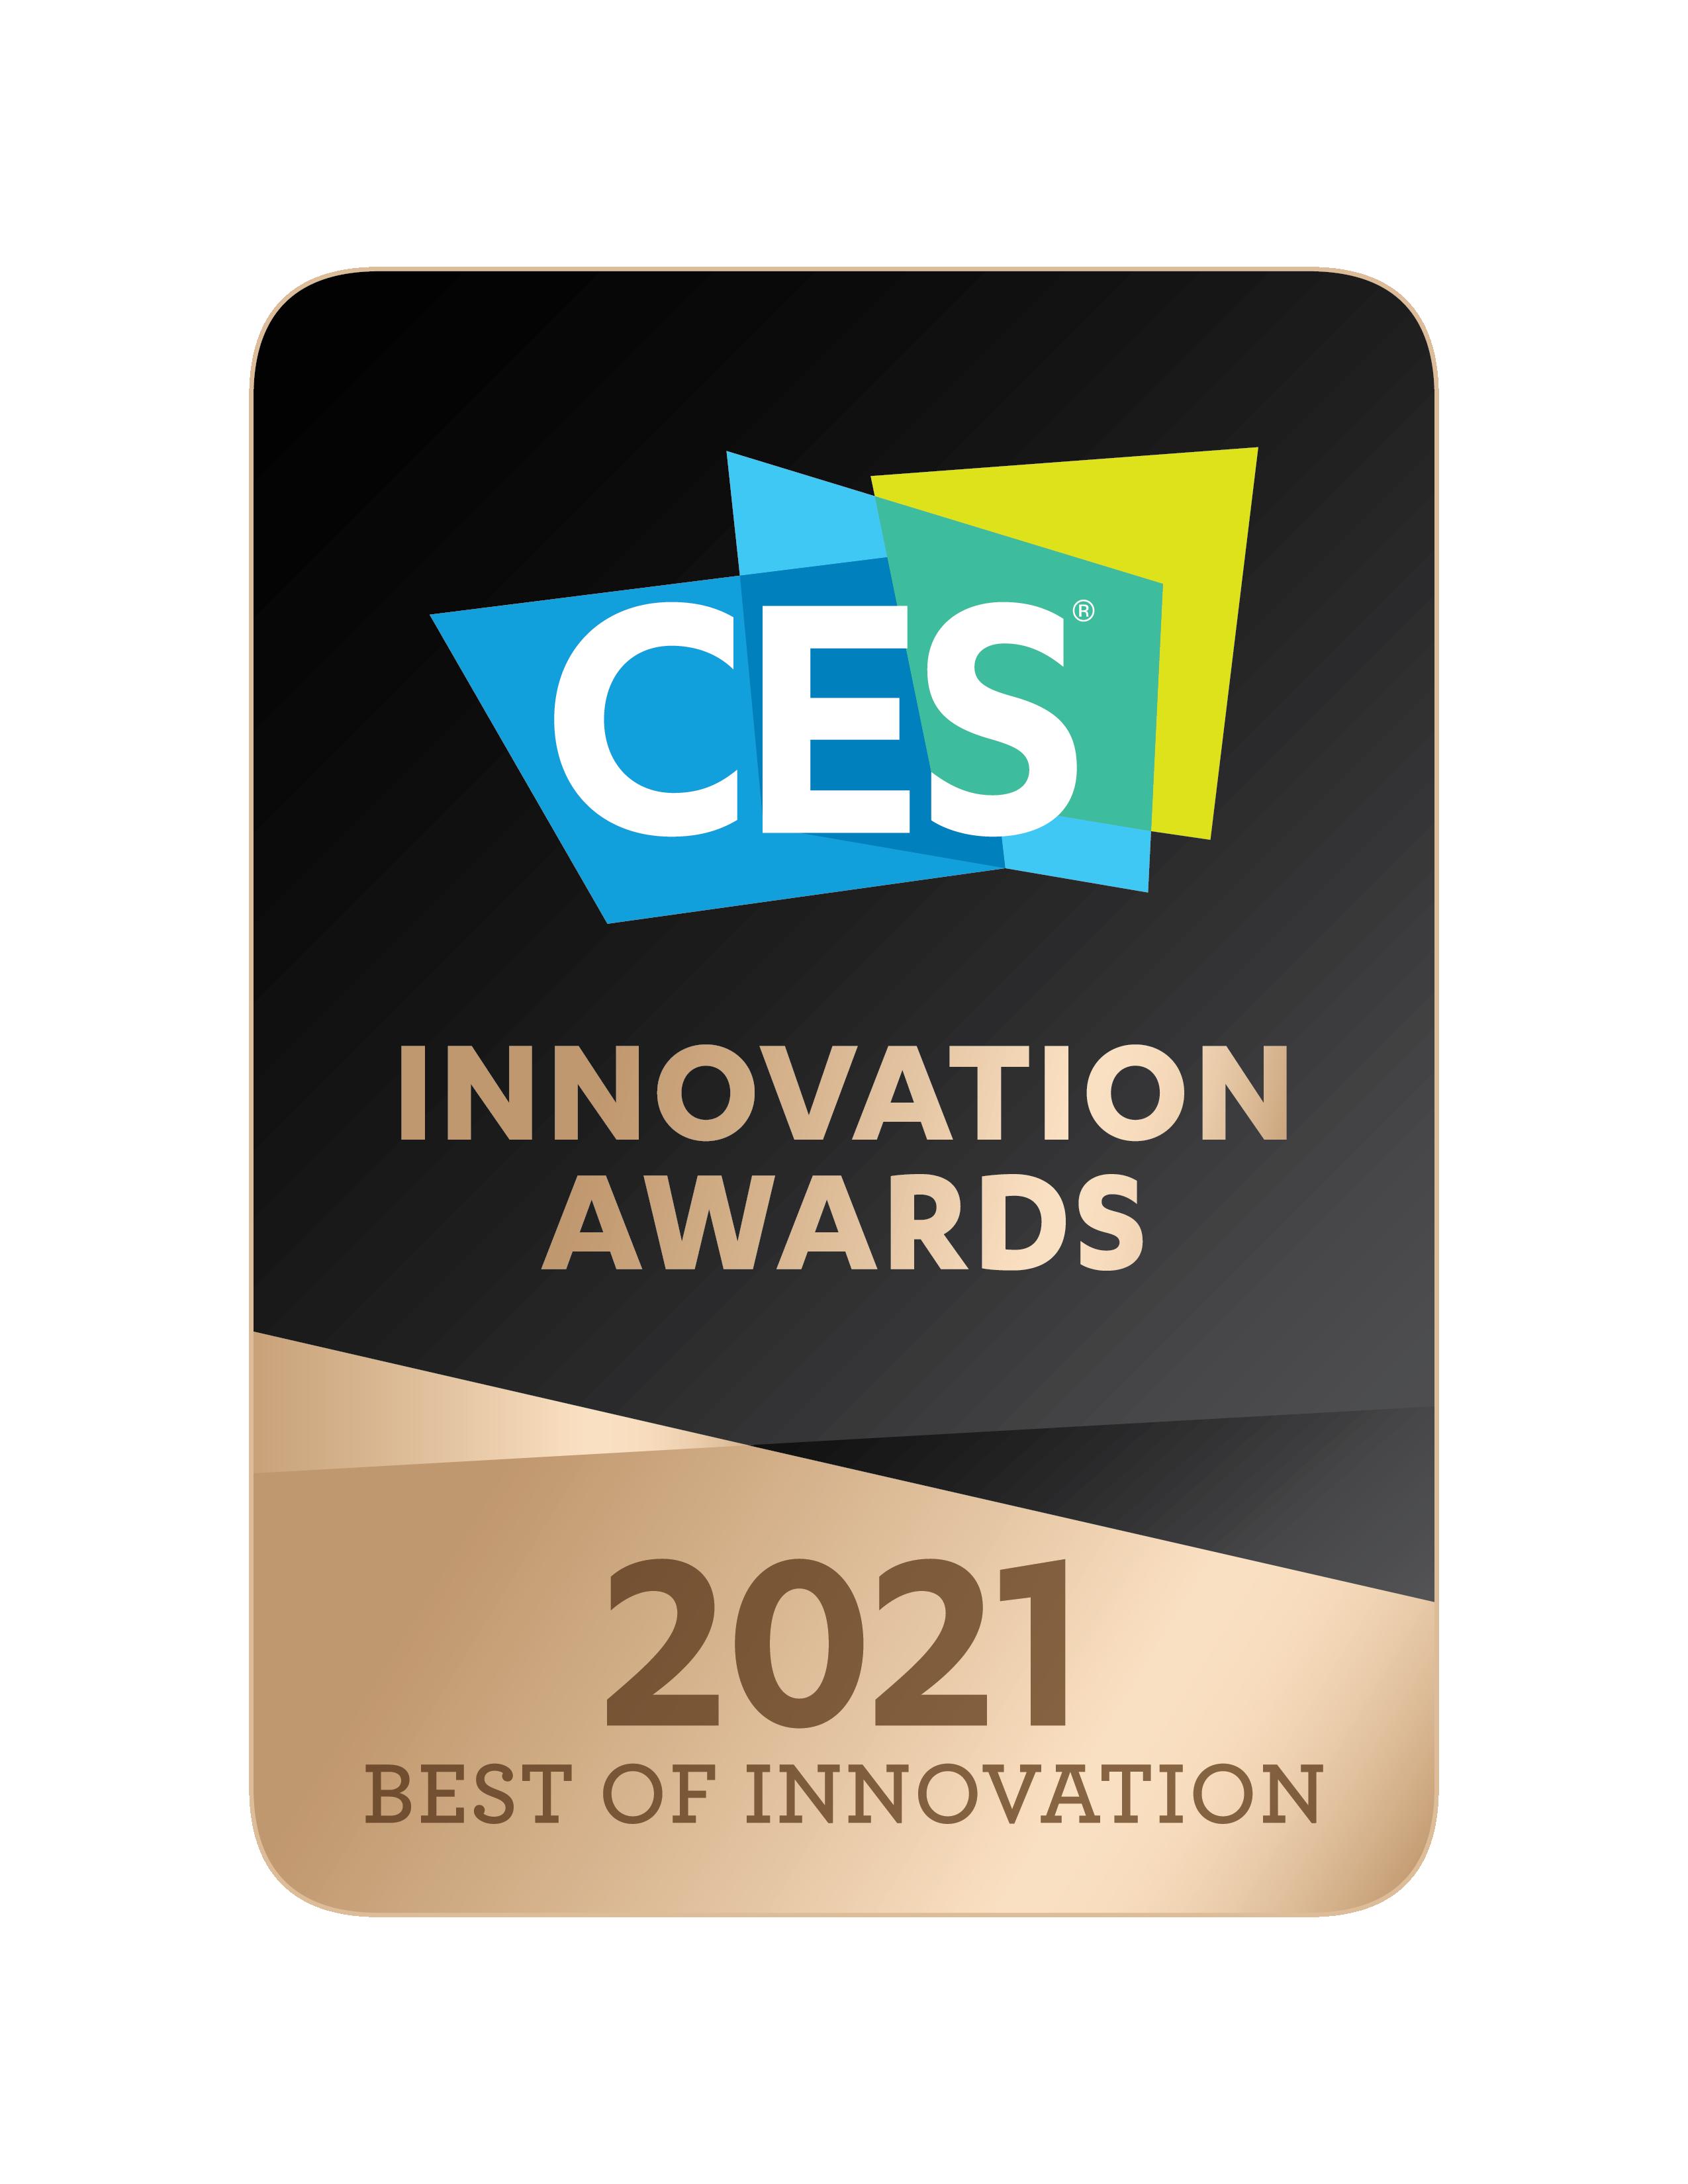 CES 2021 Best of Innovation Awards